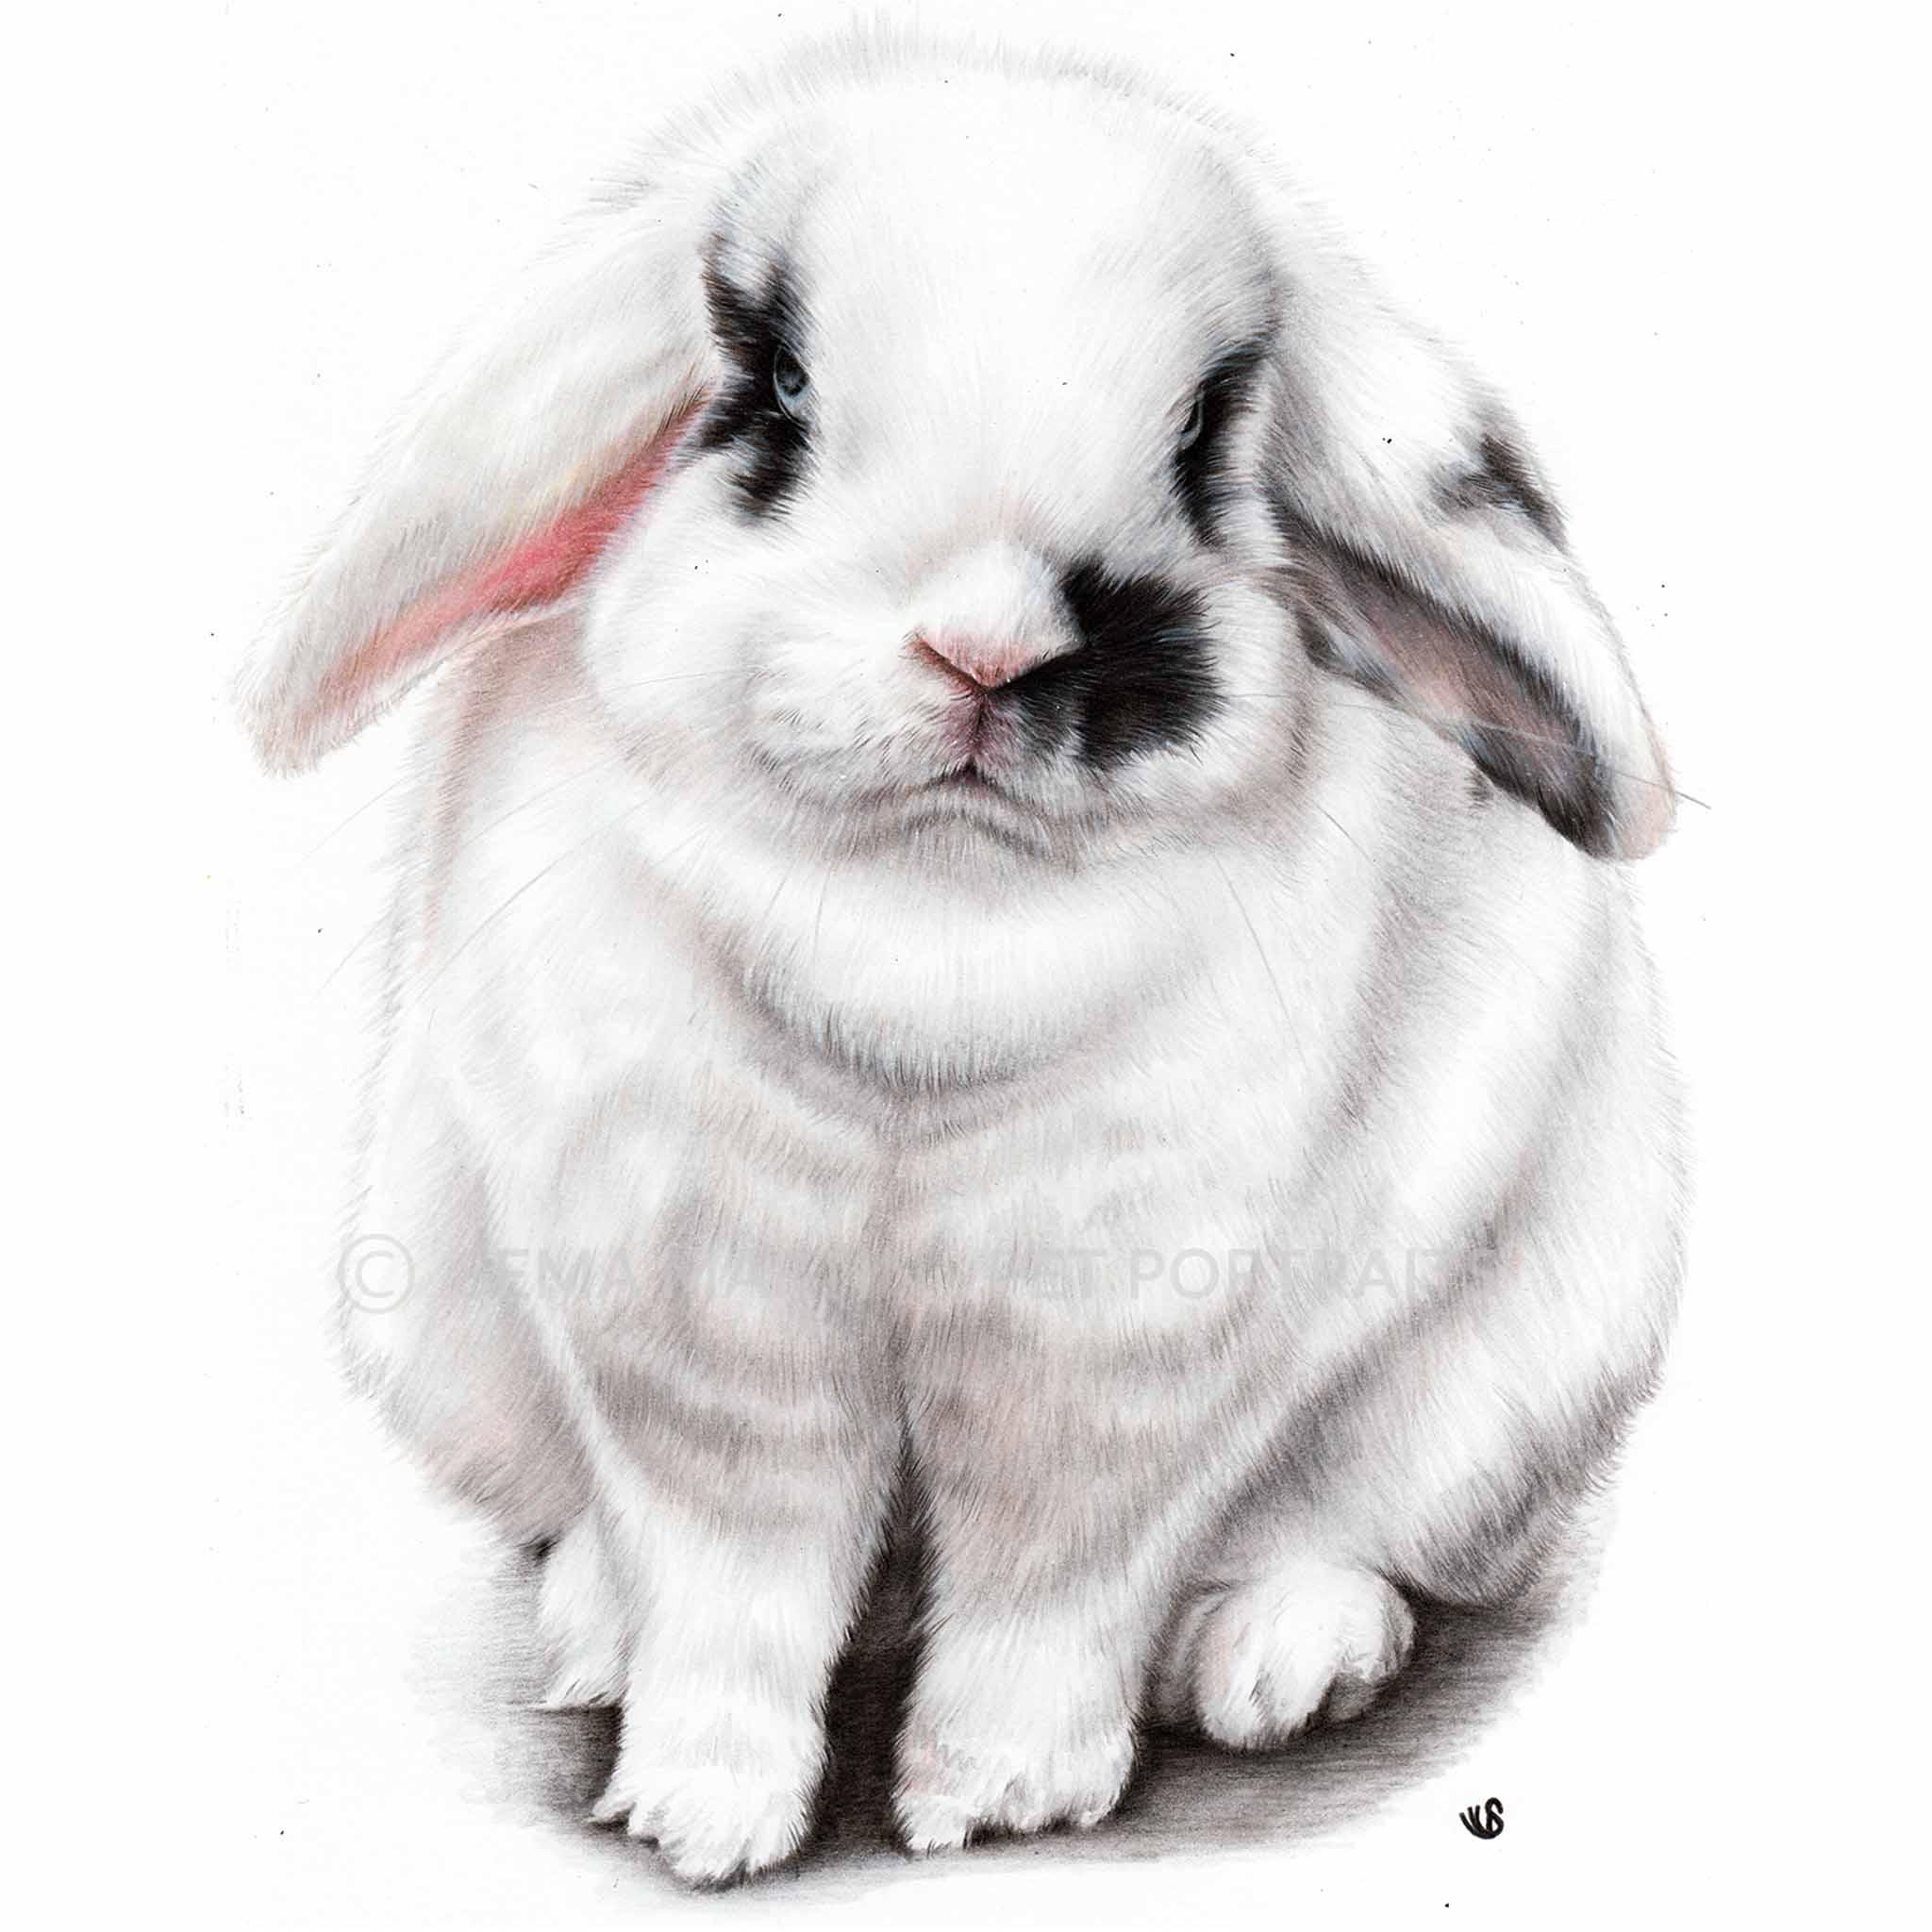 'Candy' - UK, 8.3 x 11.7 inches, 2019, Colour Pencil Portrait of a Rabbit